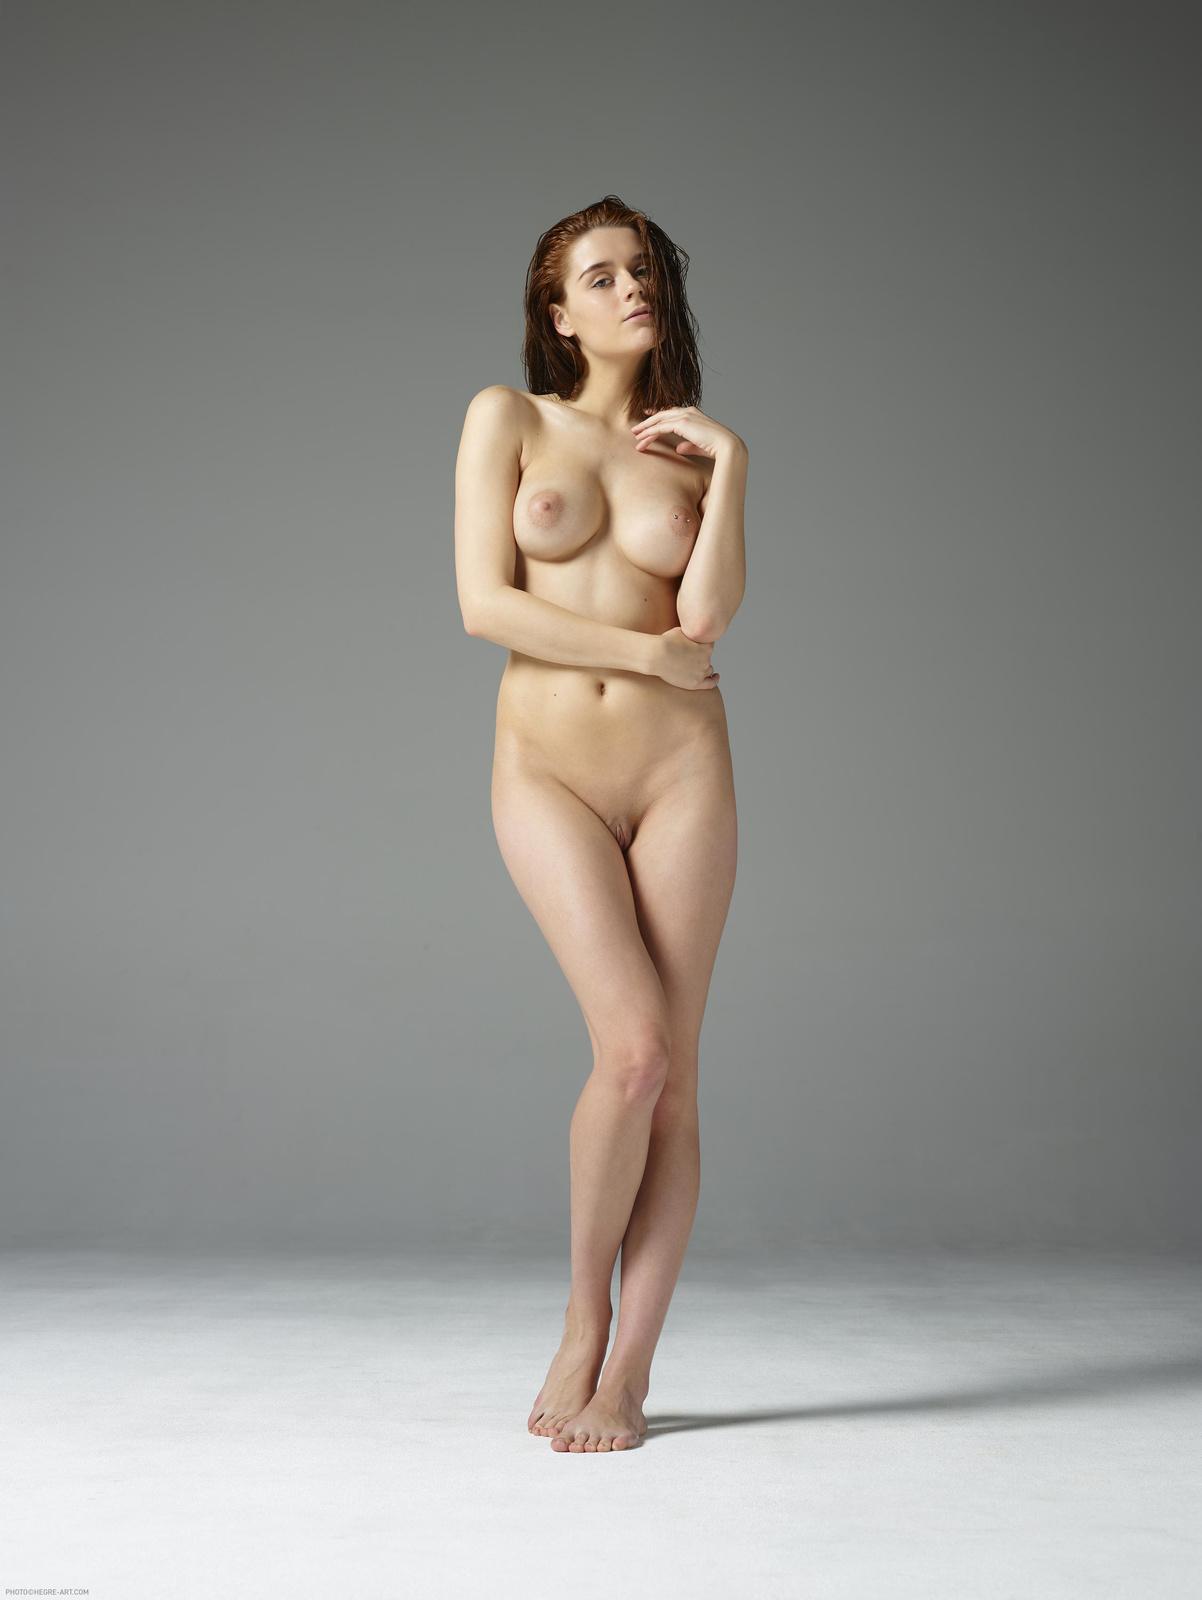 Kloe In First Nudes By Hegre-Art 16 Photos  Erotic Beauties-2157